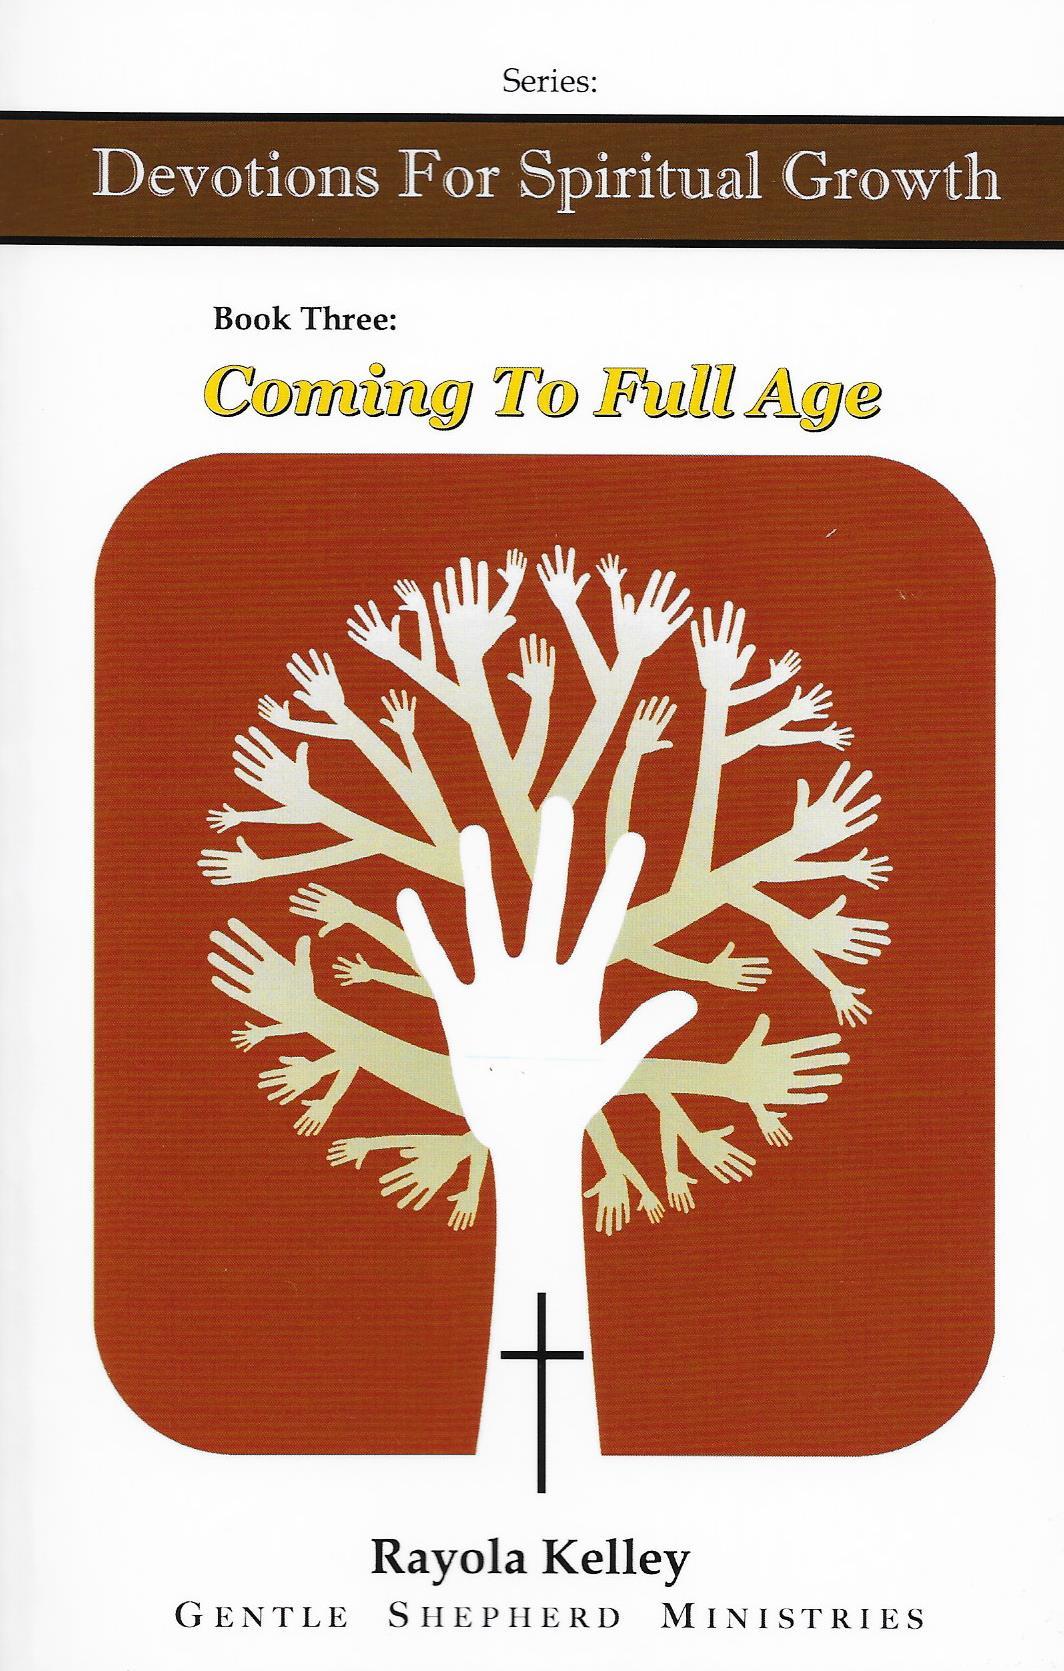 Devotion on spiritual maturity